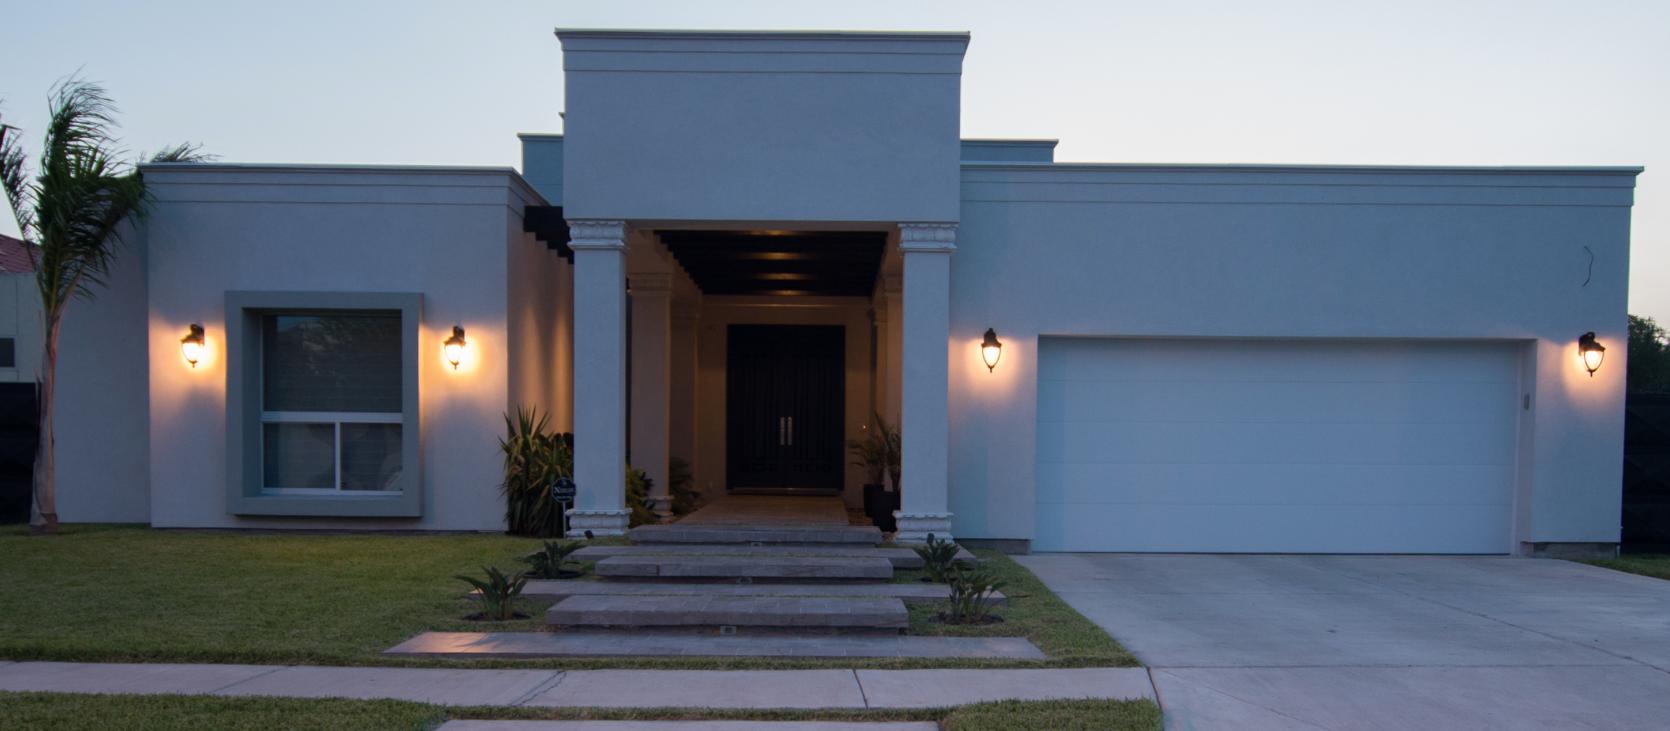 JESSAL HOUSE | BROWNSVILLE, TX